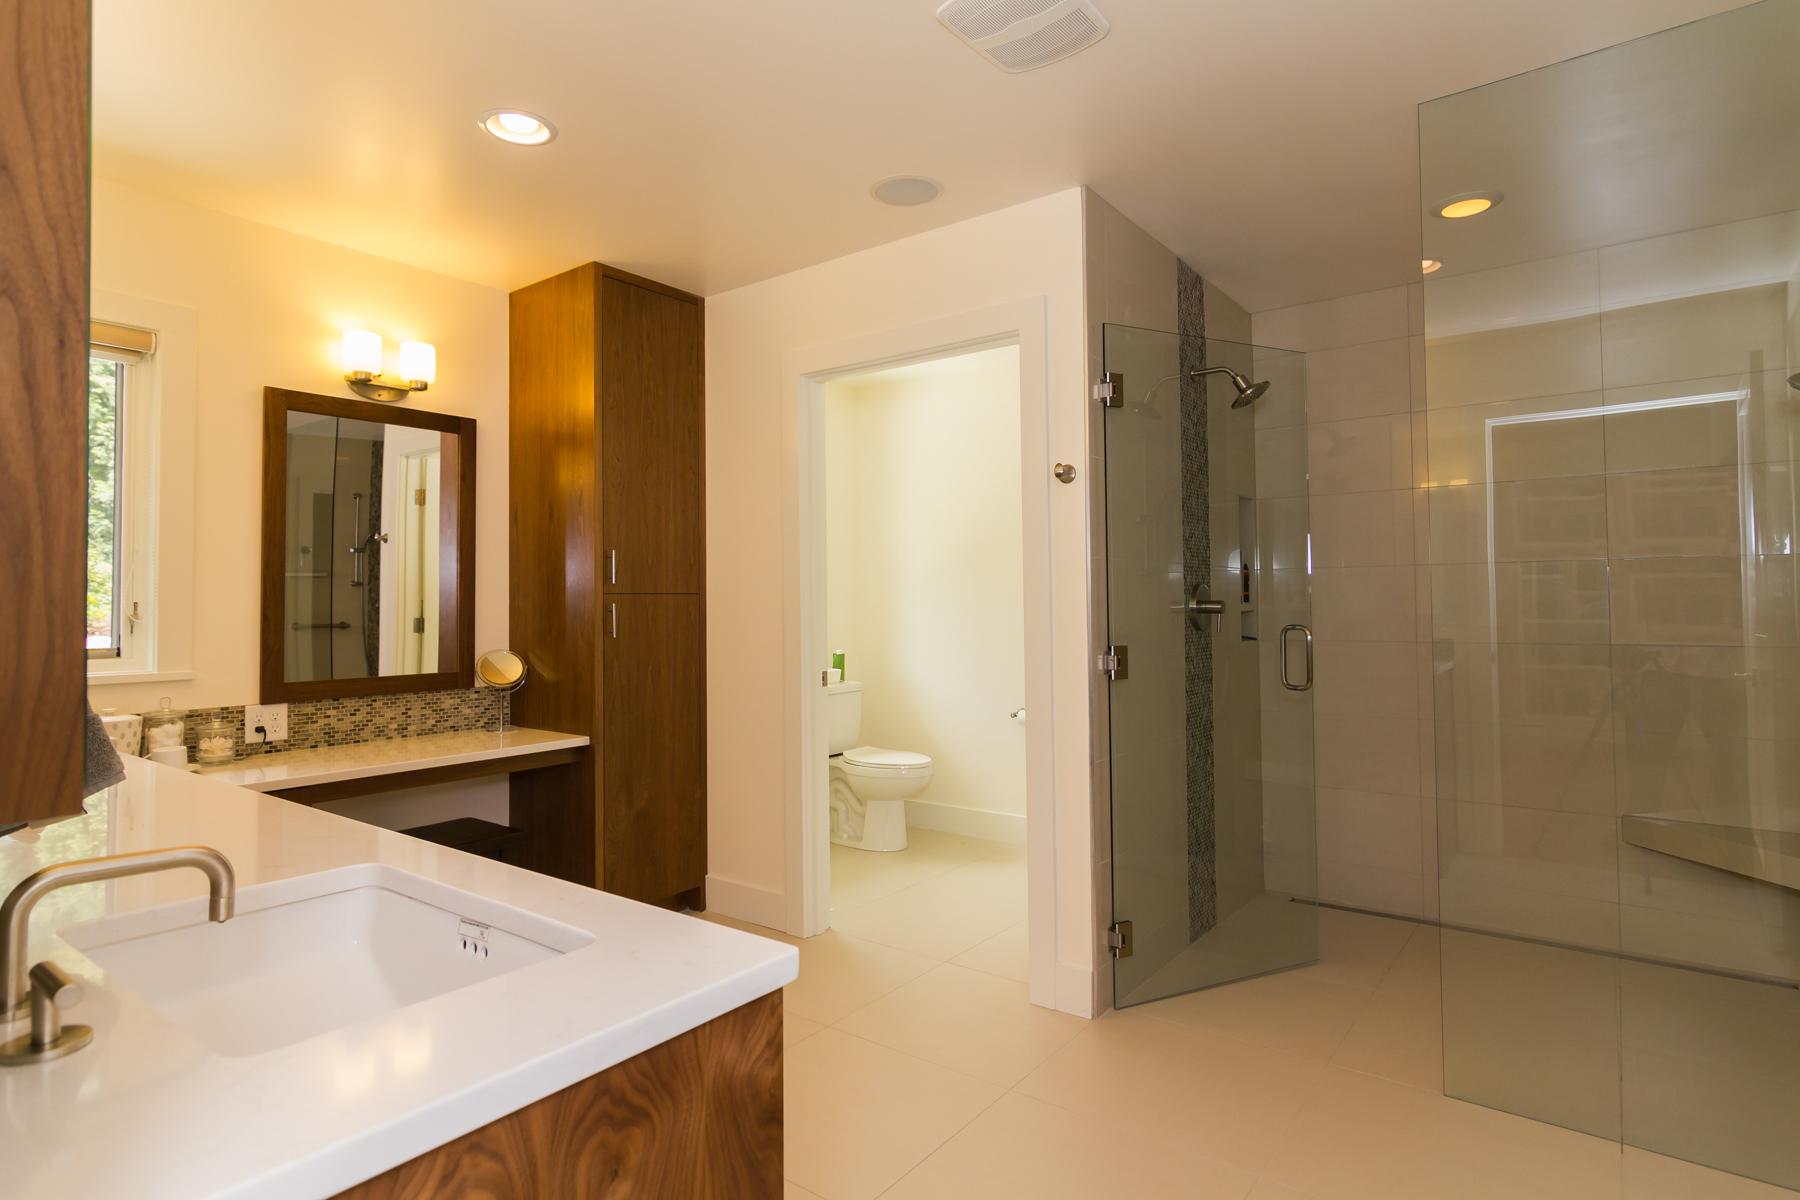 New master bathroom with no-thresholdglass shower enclosure, heated stone floors, vanity station, and custom walnut cabinets